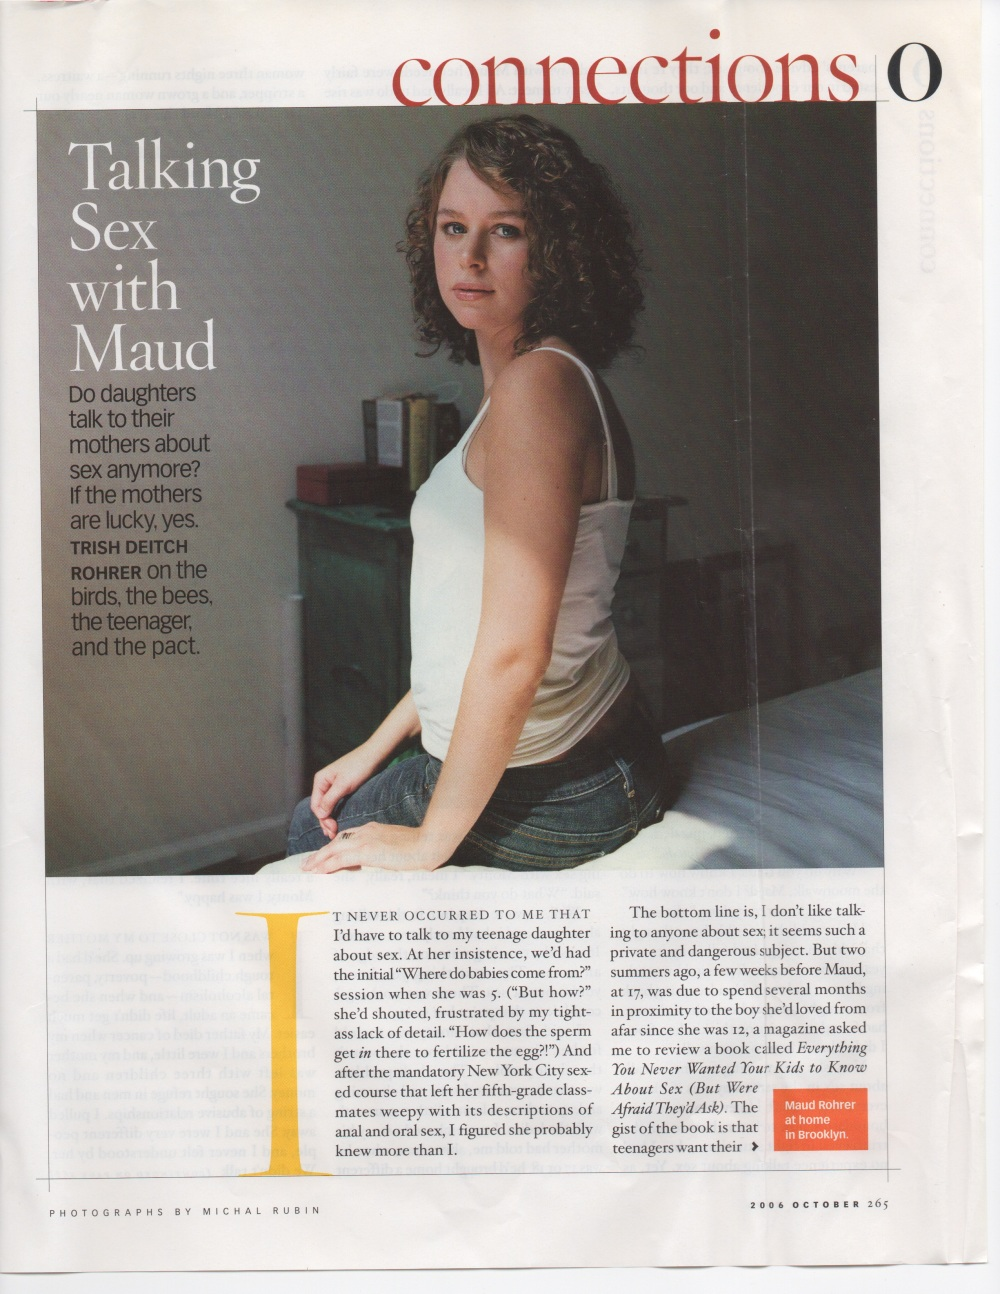 O, The Oprah Magazine, October, 2006